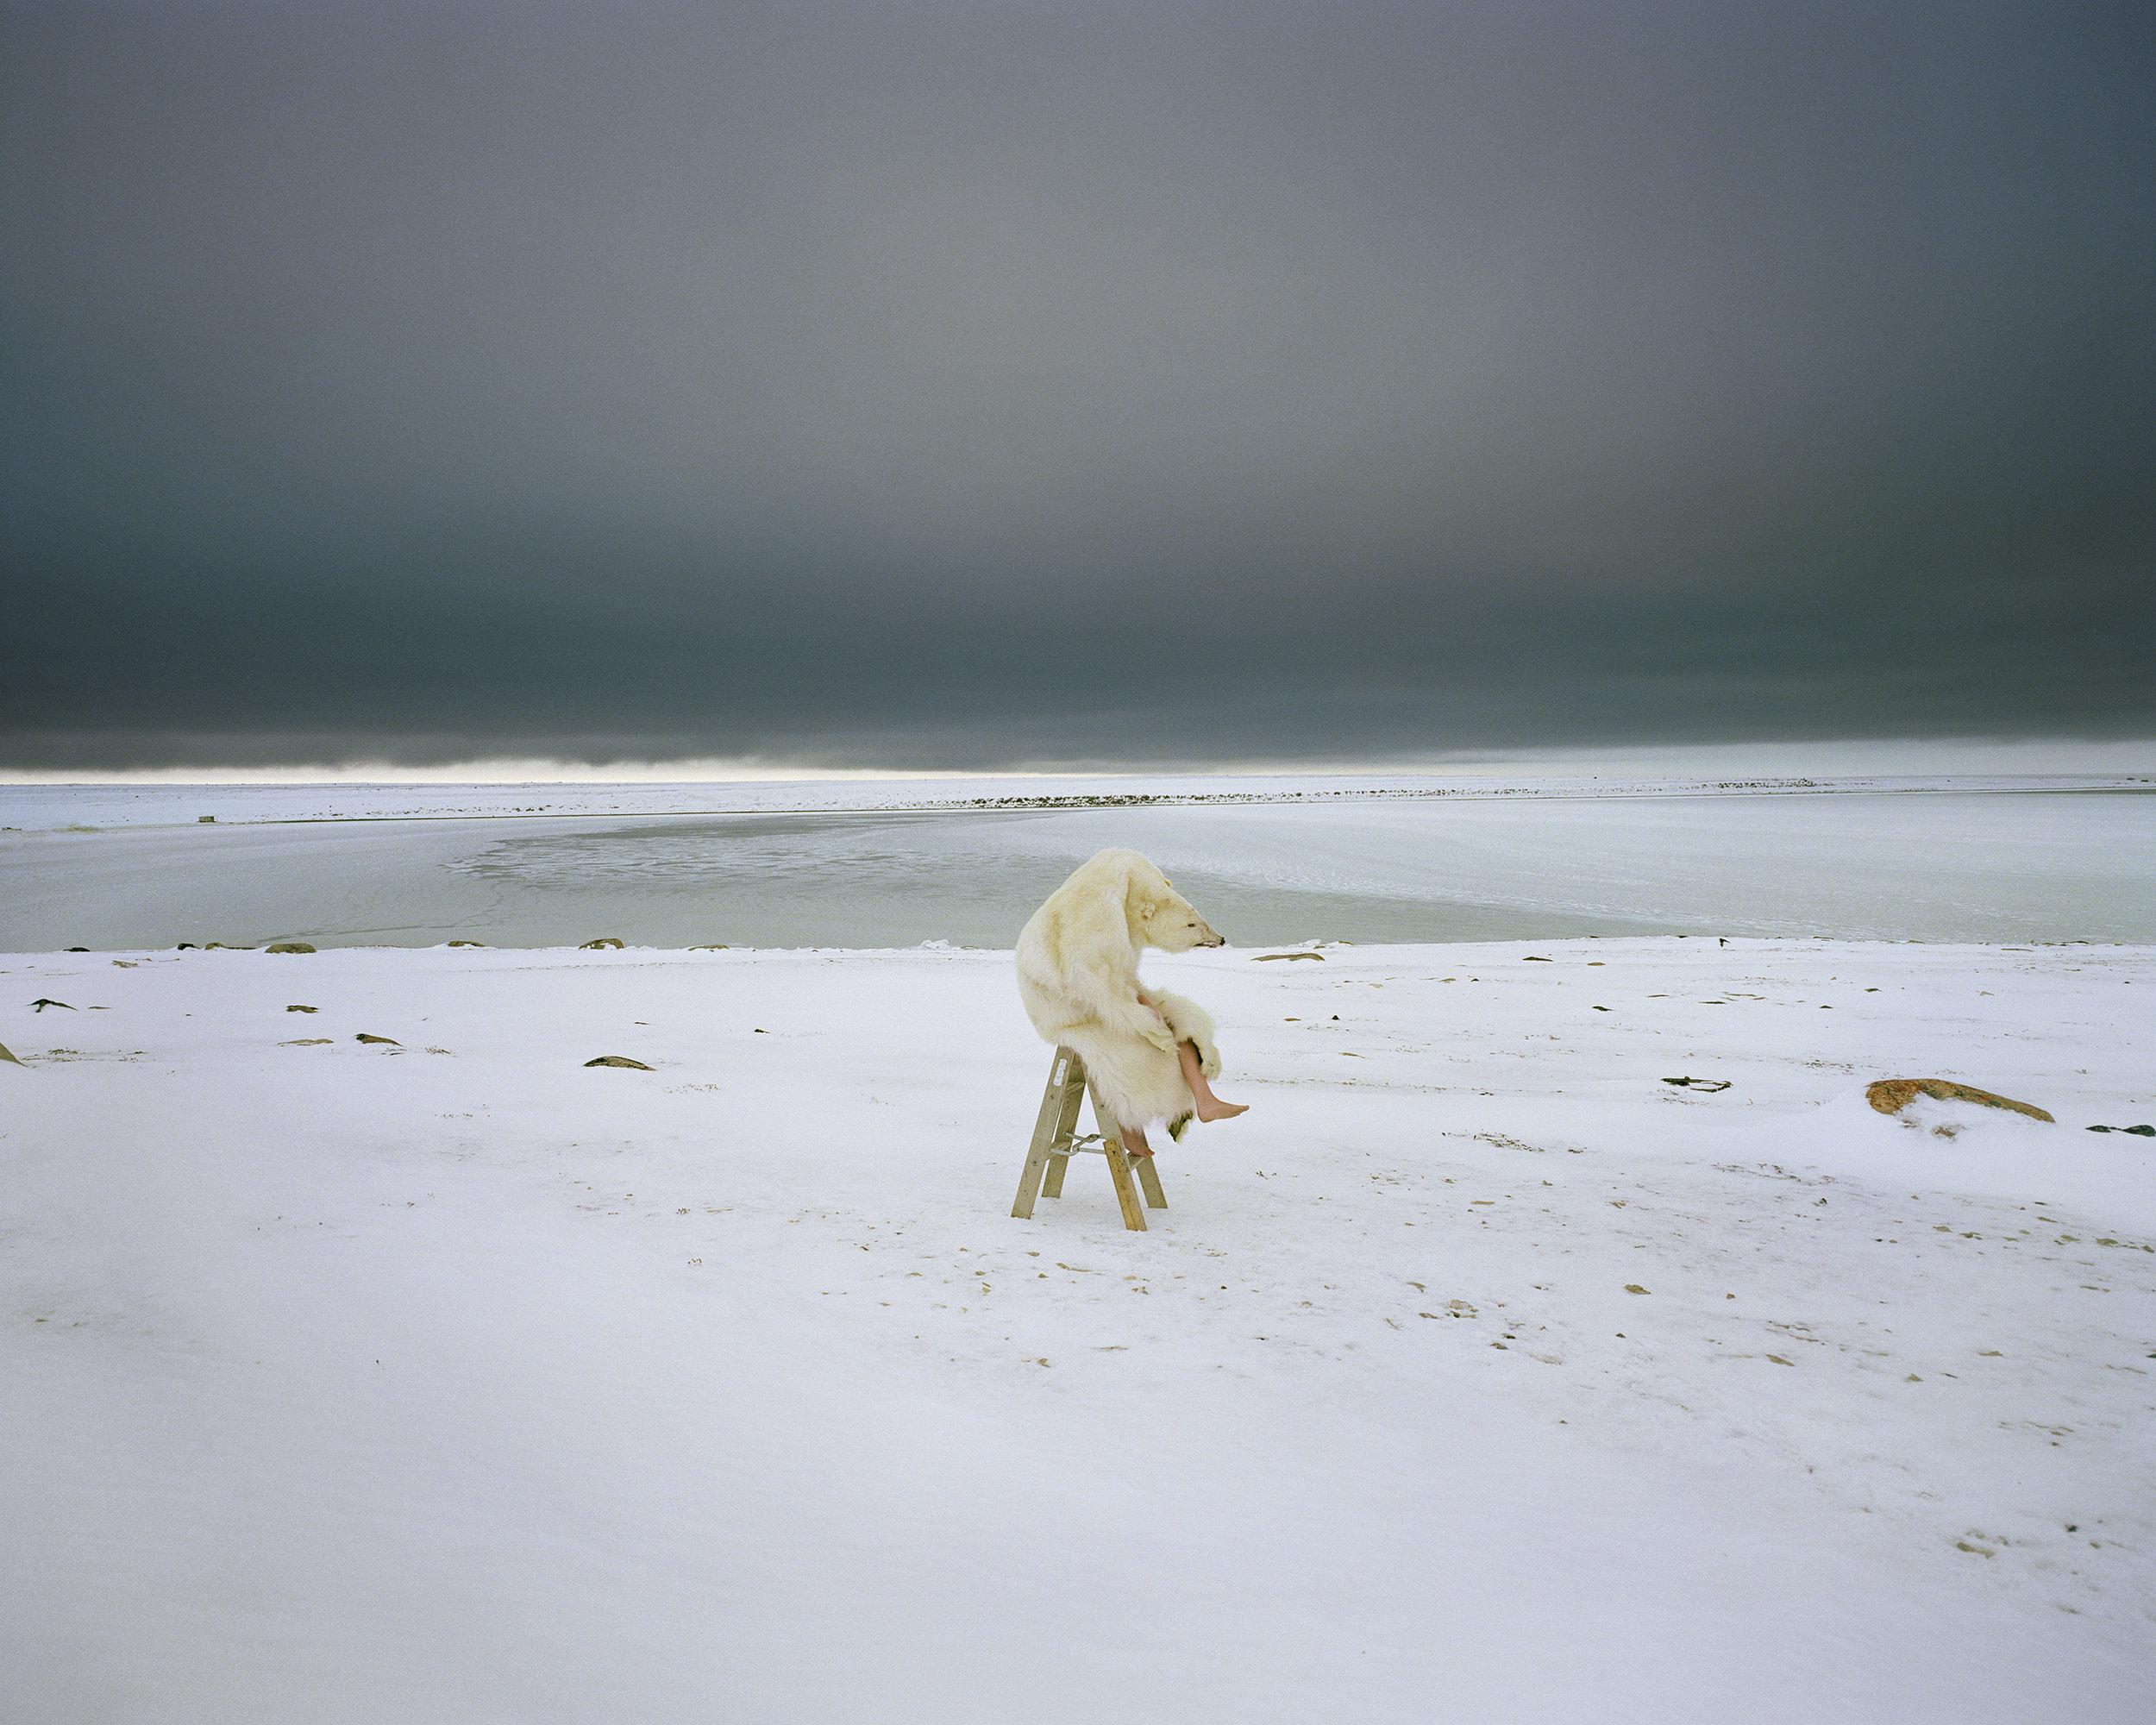 © Scarlett Hooft Graafland, Polar Bear, 2007